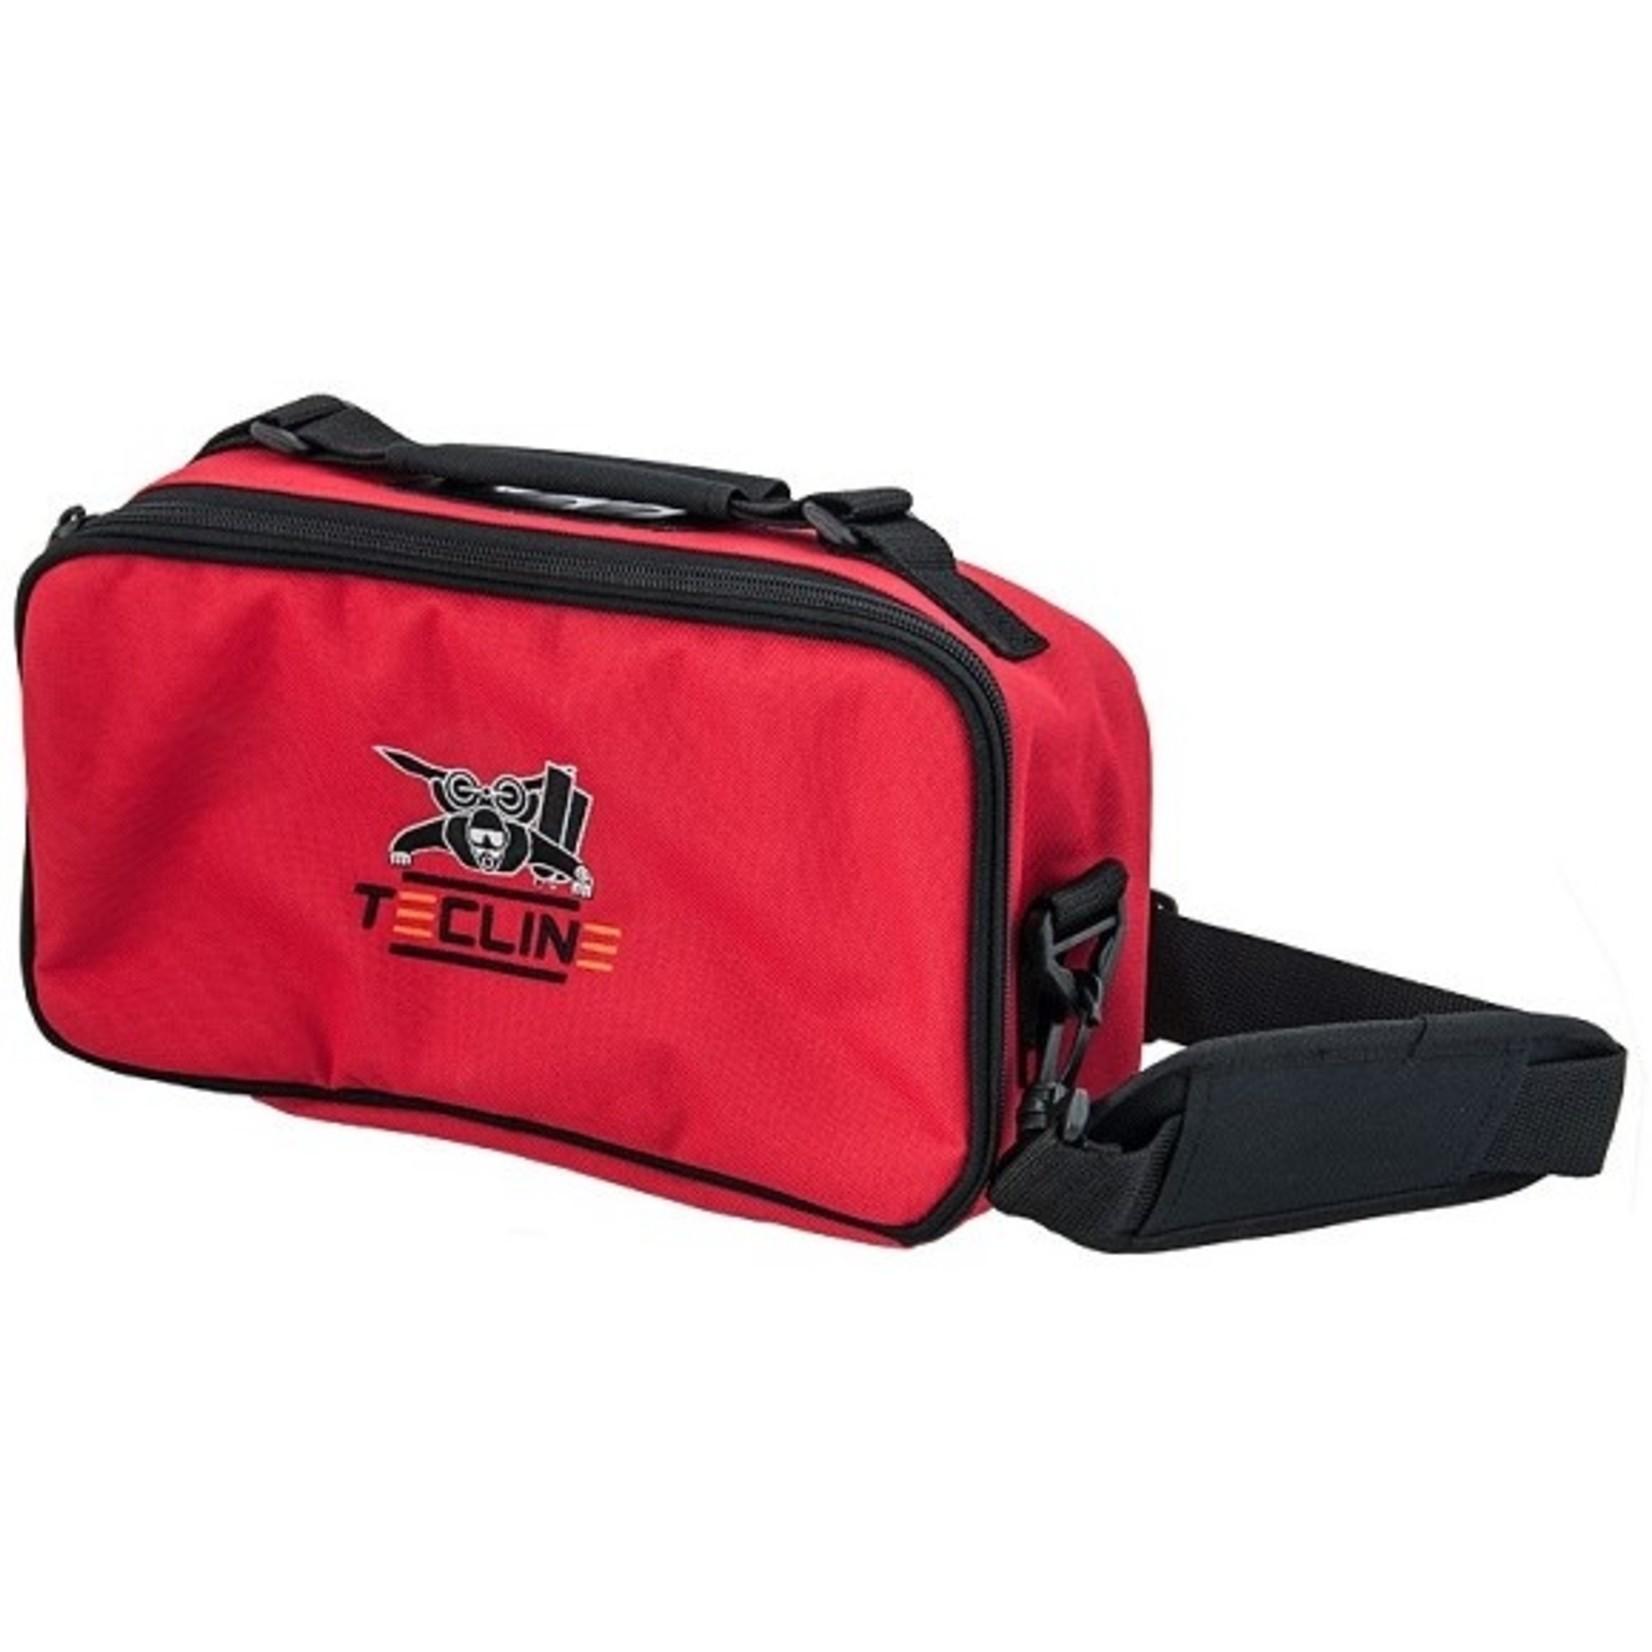 Tecline Bag for regulator red